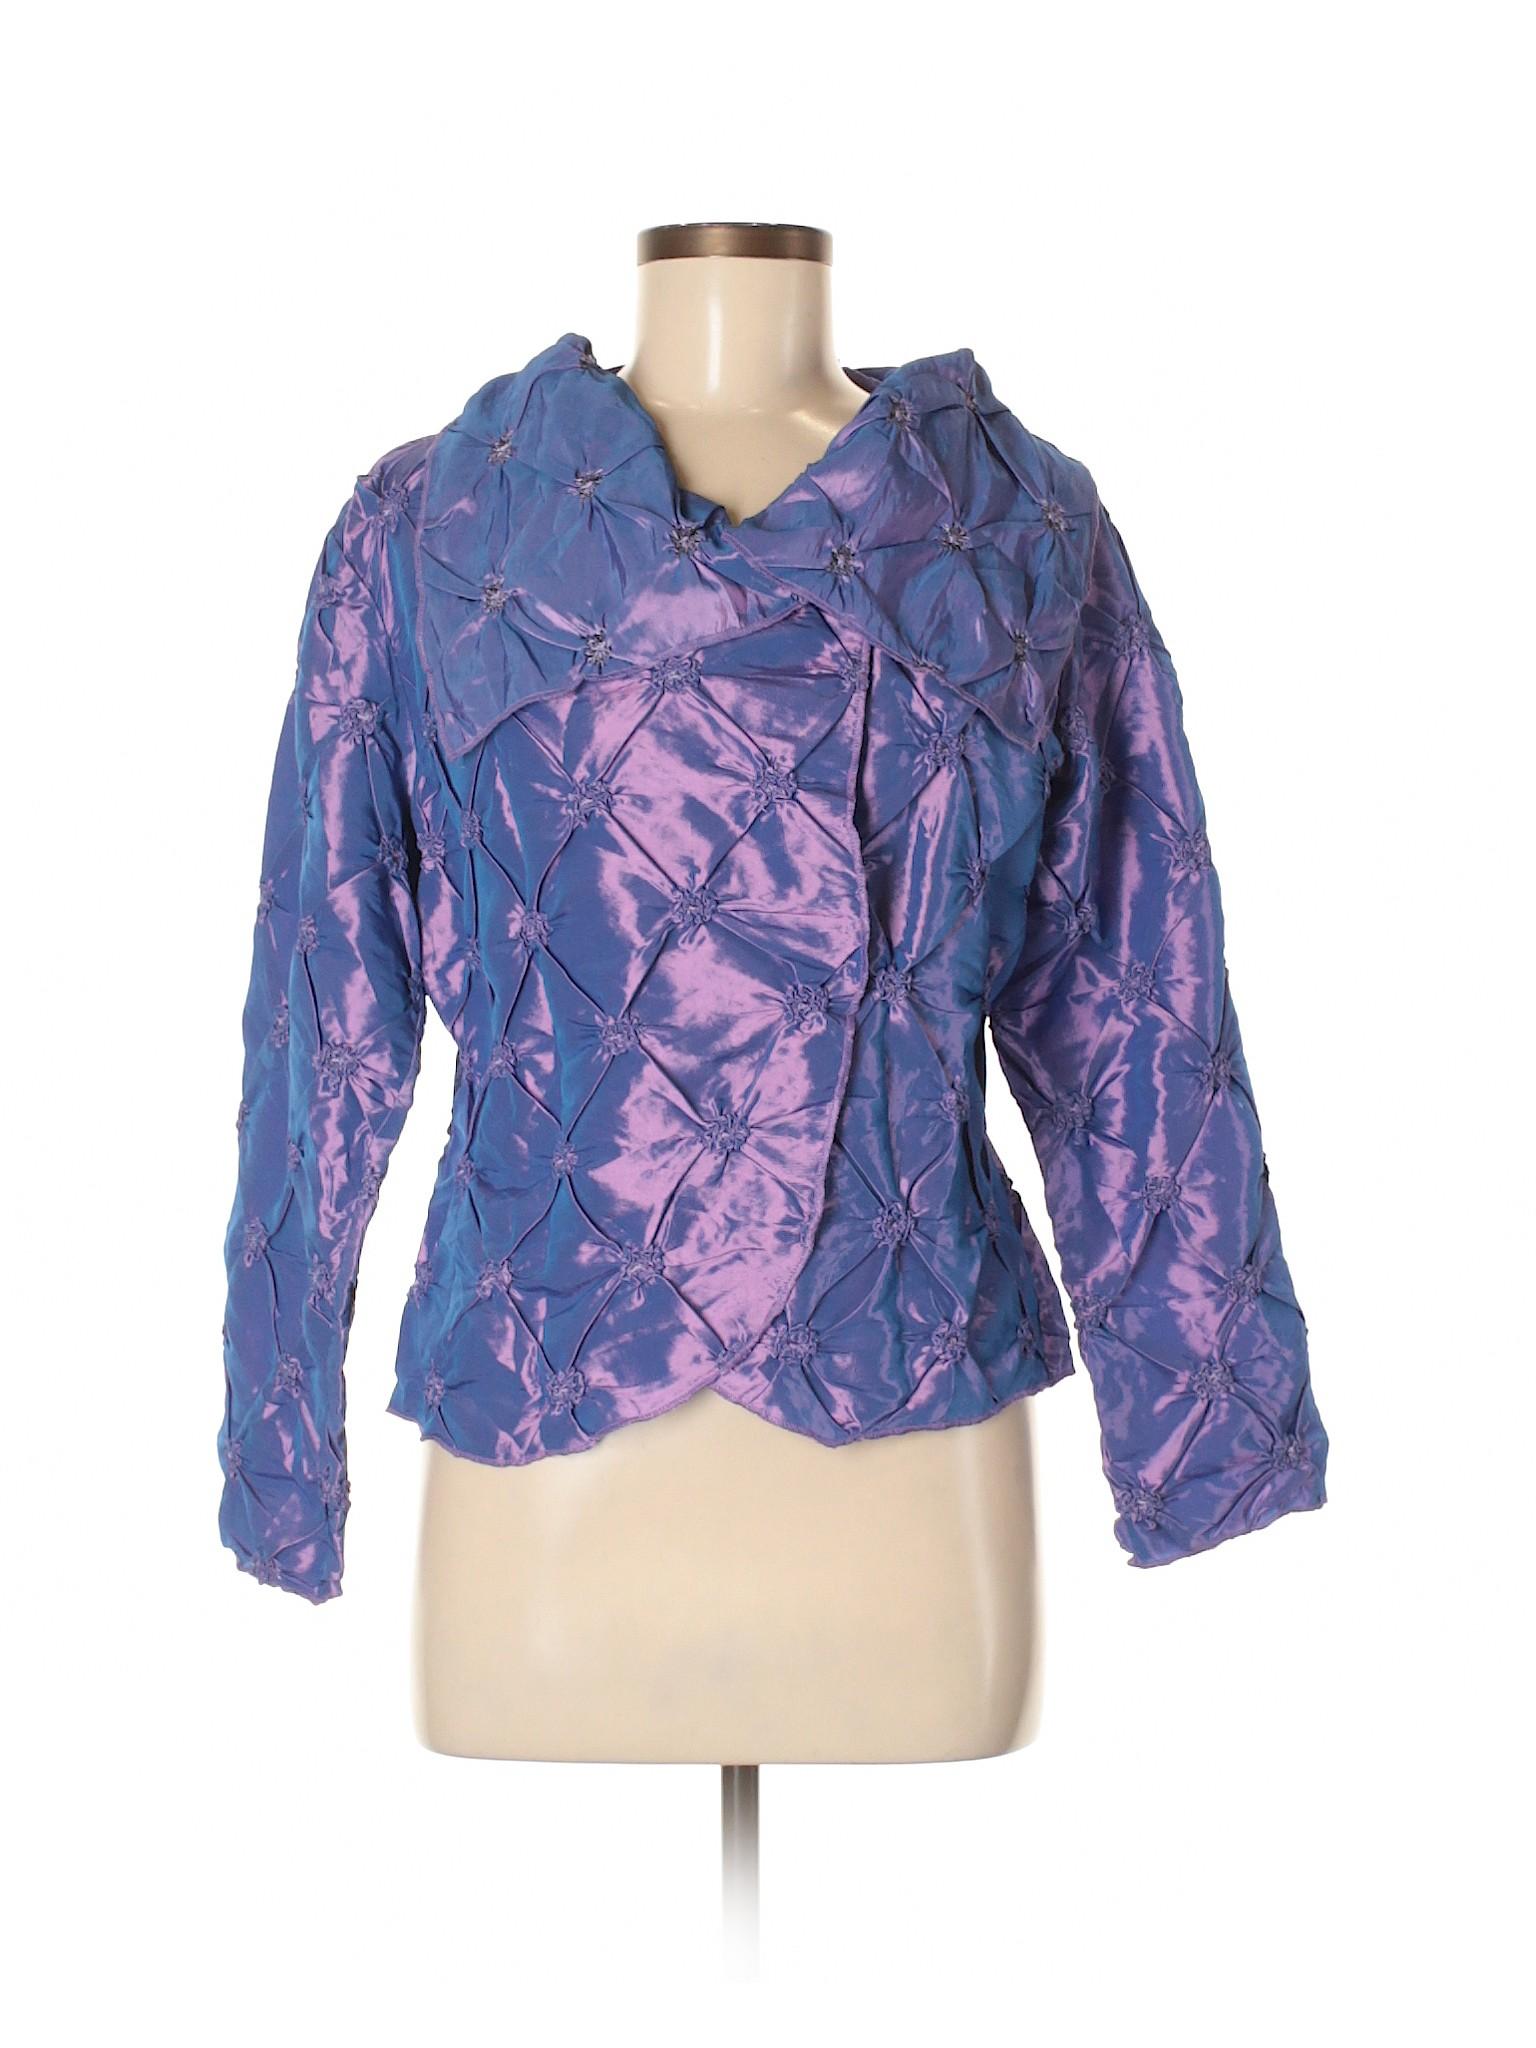 Silk leisure Box Box Jacket leisure Silk Jacket leisure Jacket Boutique Box Silk Boutique Boutique BFUPqwxfF